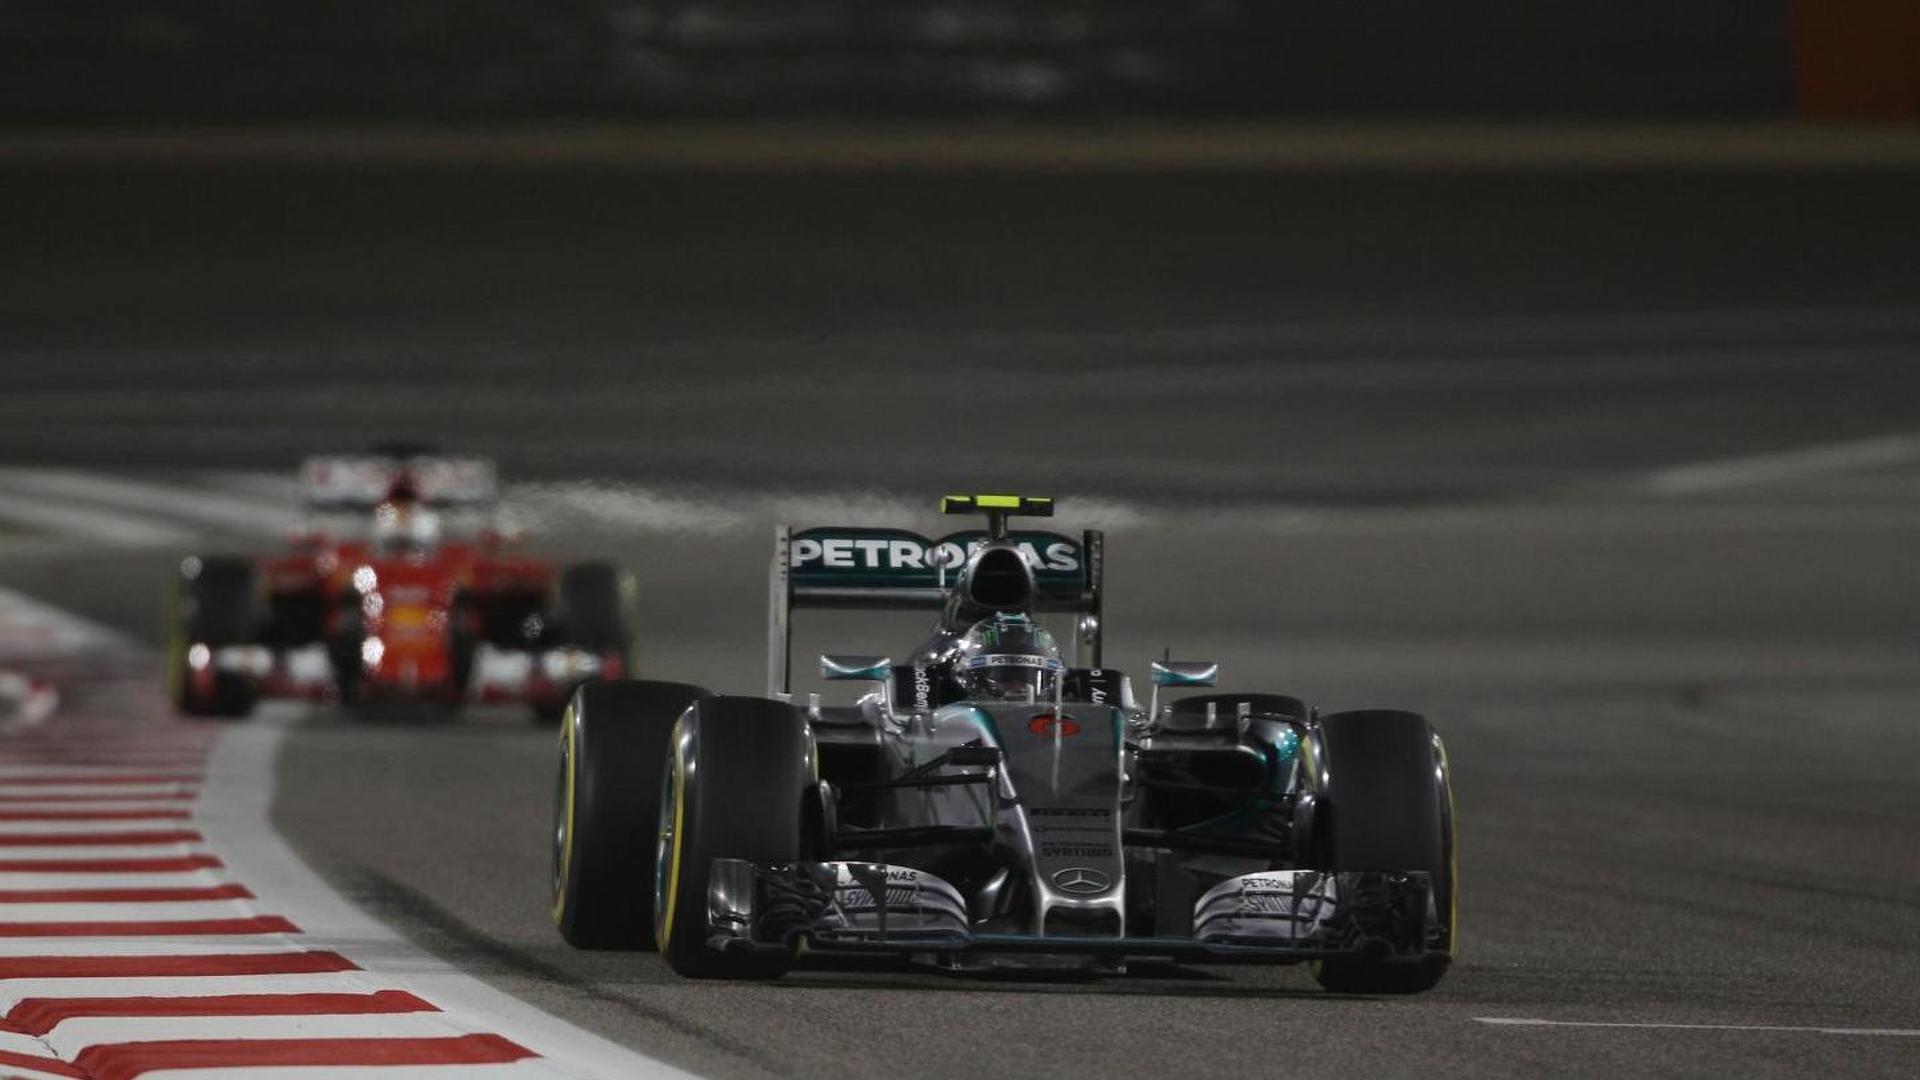 Rosberg must win in Monaco, Montreal - Prost